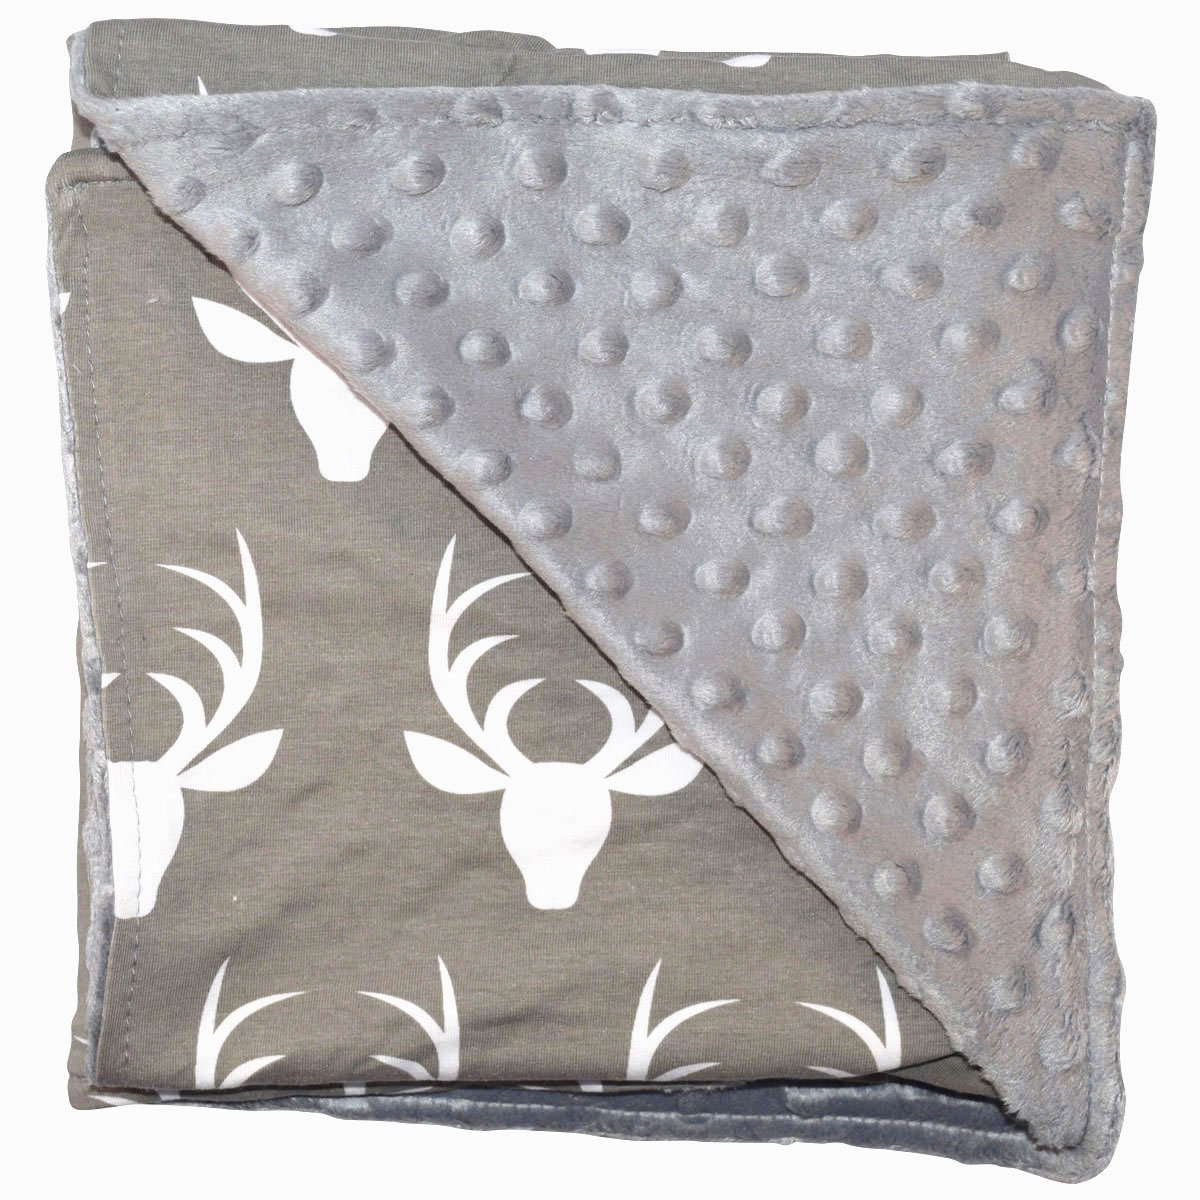 Unique Baby Soft Textured Minky Dot Blanket, Moose Grey by Unique Baby   B01IPVFSDO